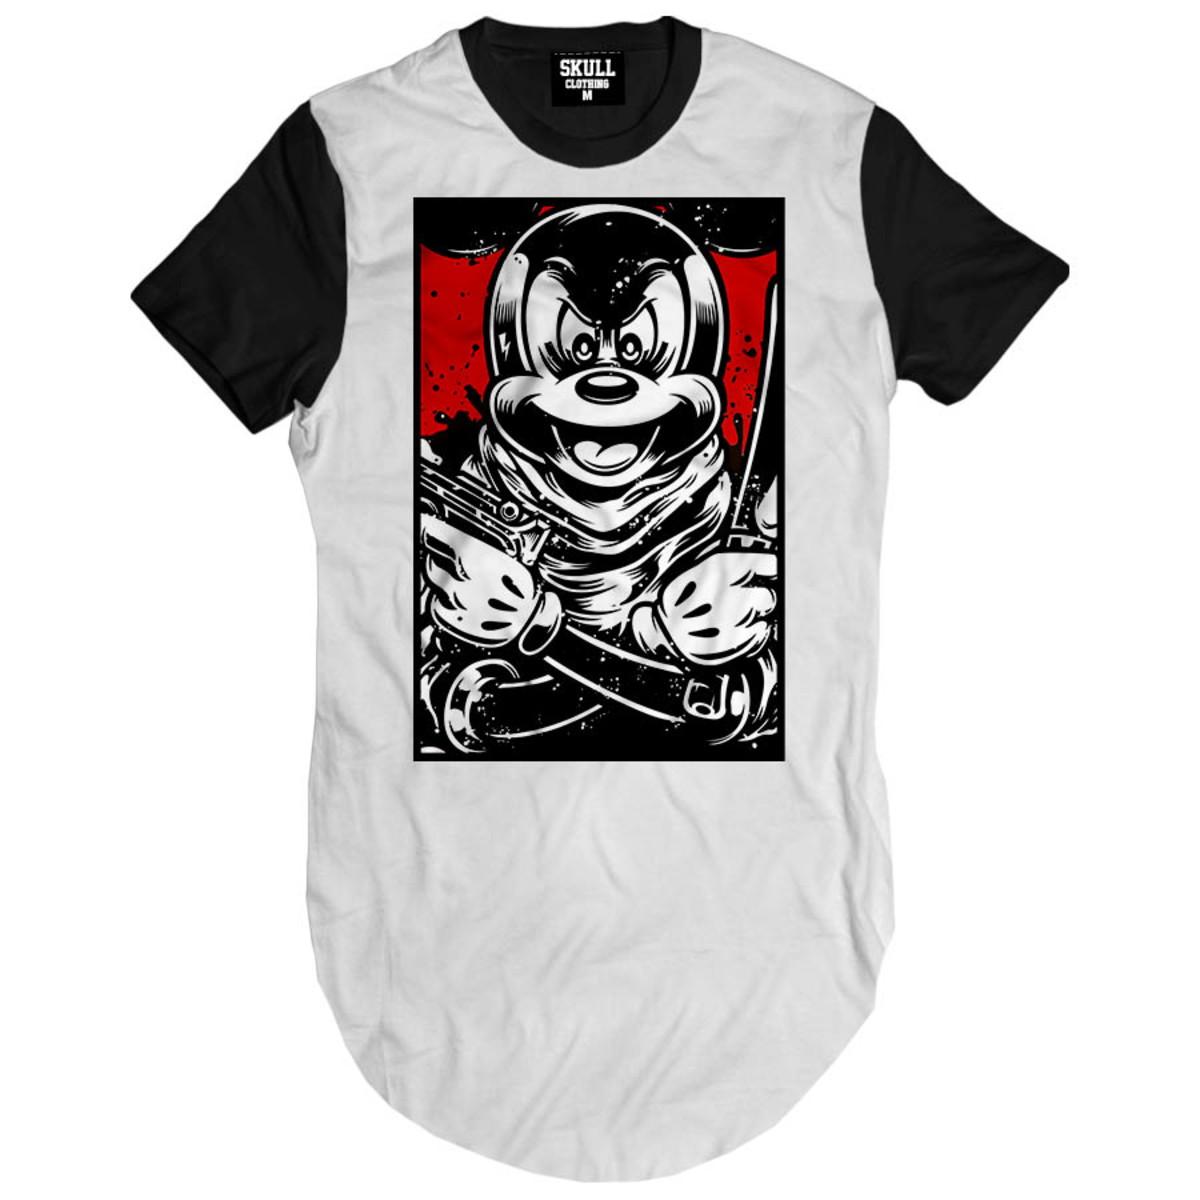 265f529584 Camiseta longa masculina thug mickey camisa swag hip hop no elo jpg  1200x1200 Camiseta longa masculina